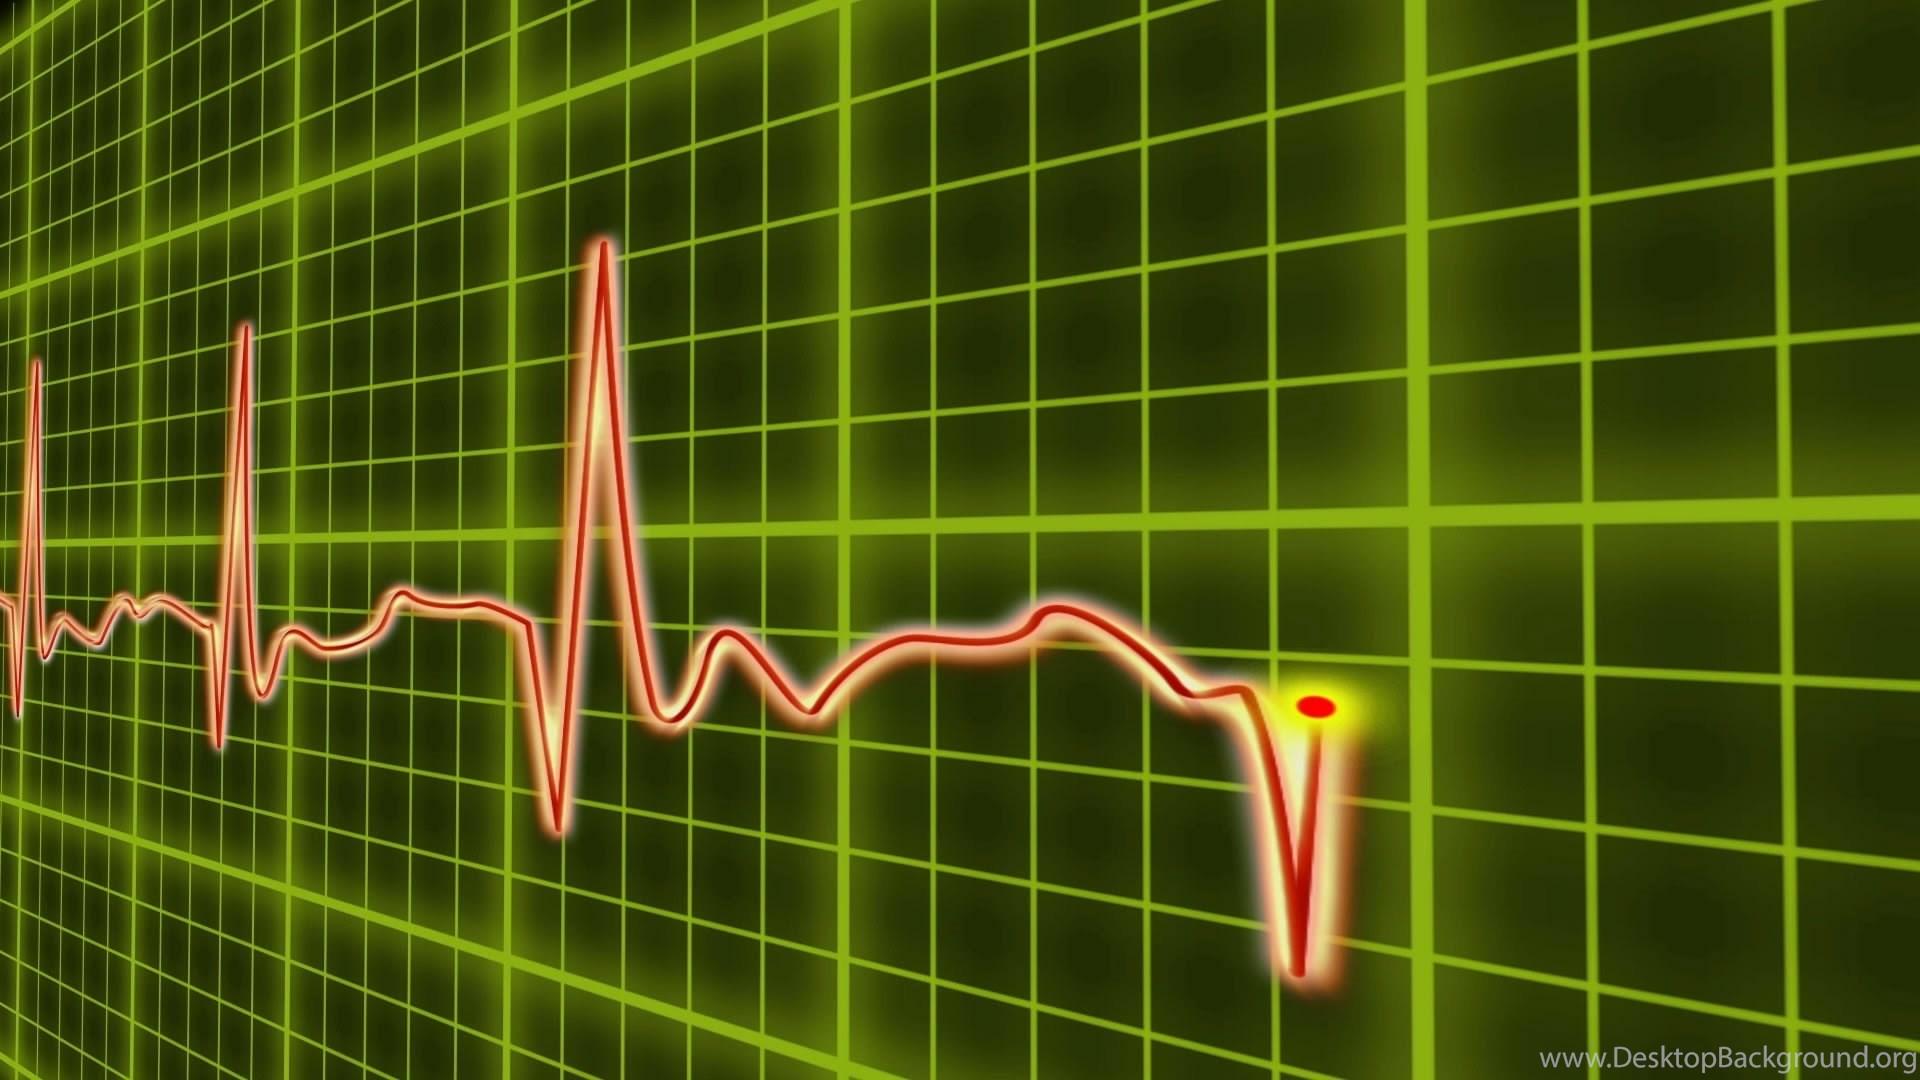 592000 ekg cardio heart beat normal and zero pulse with audio